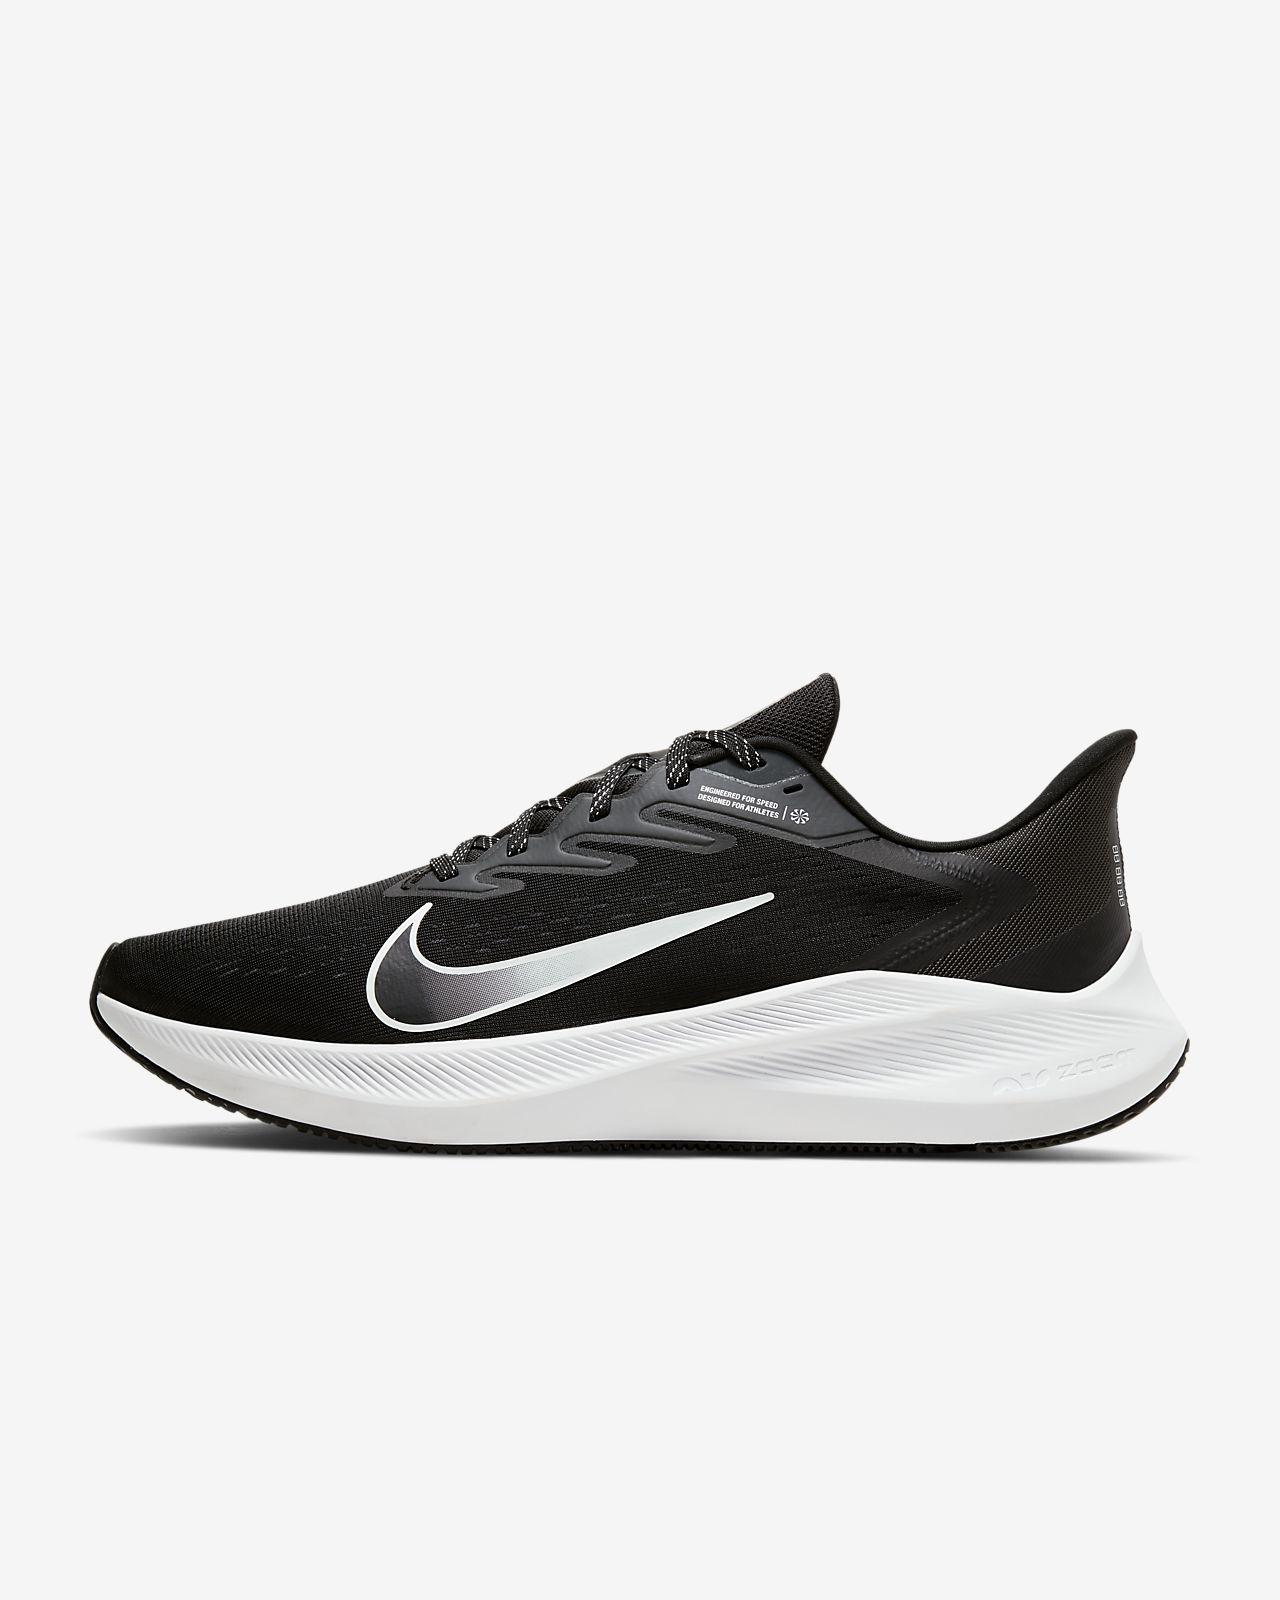 Nike Air Zoom Winflo 7 Zapatillas de running - Hombre